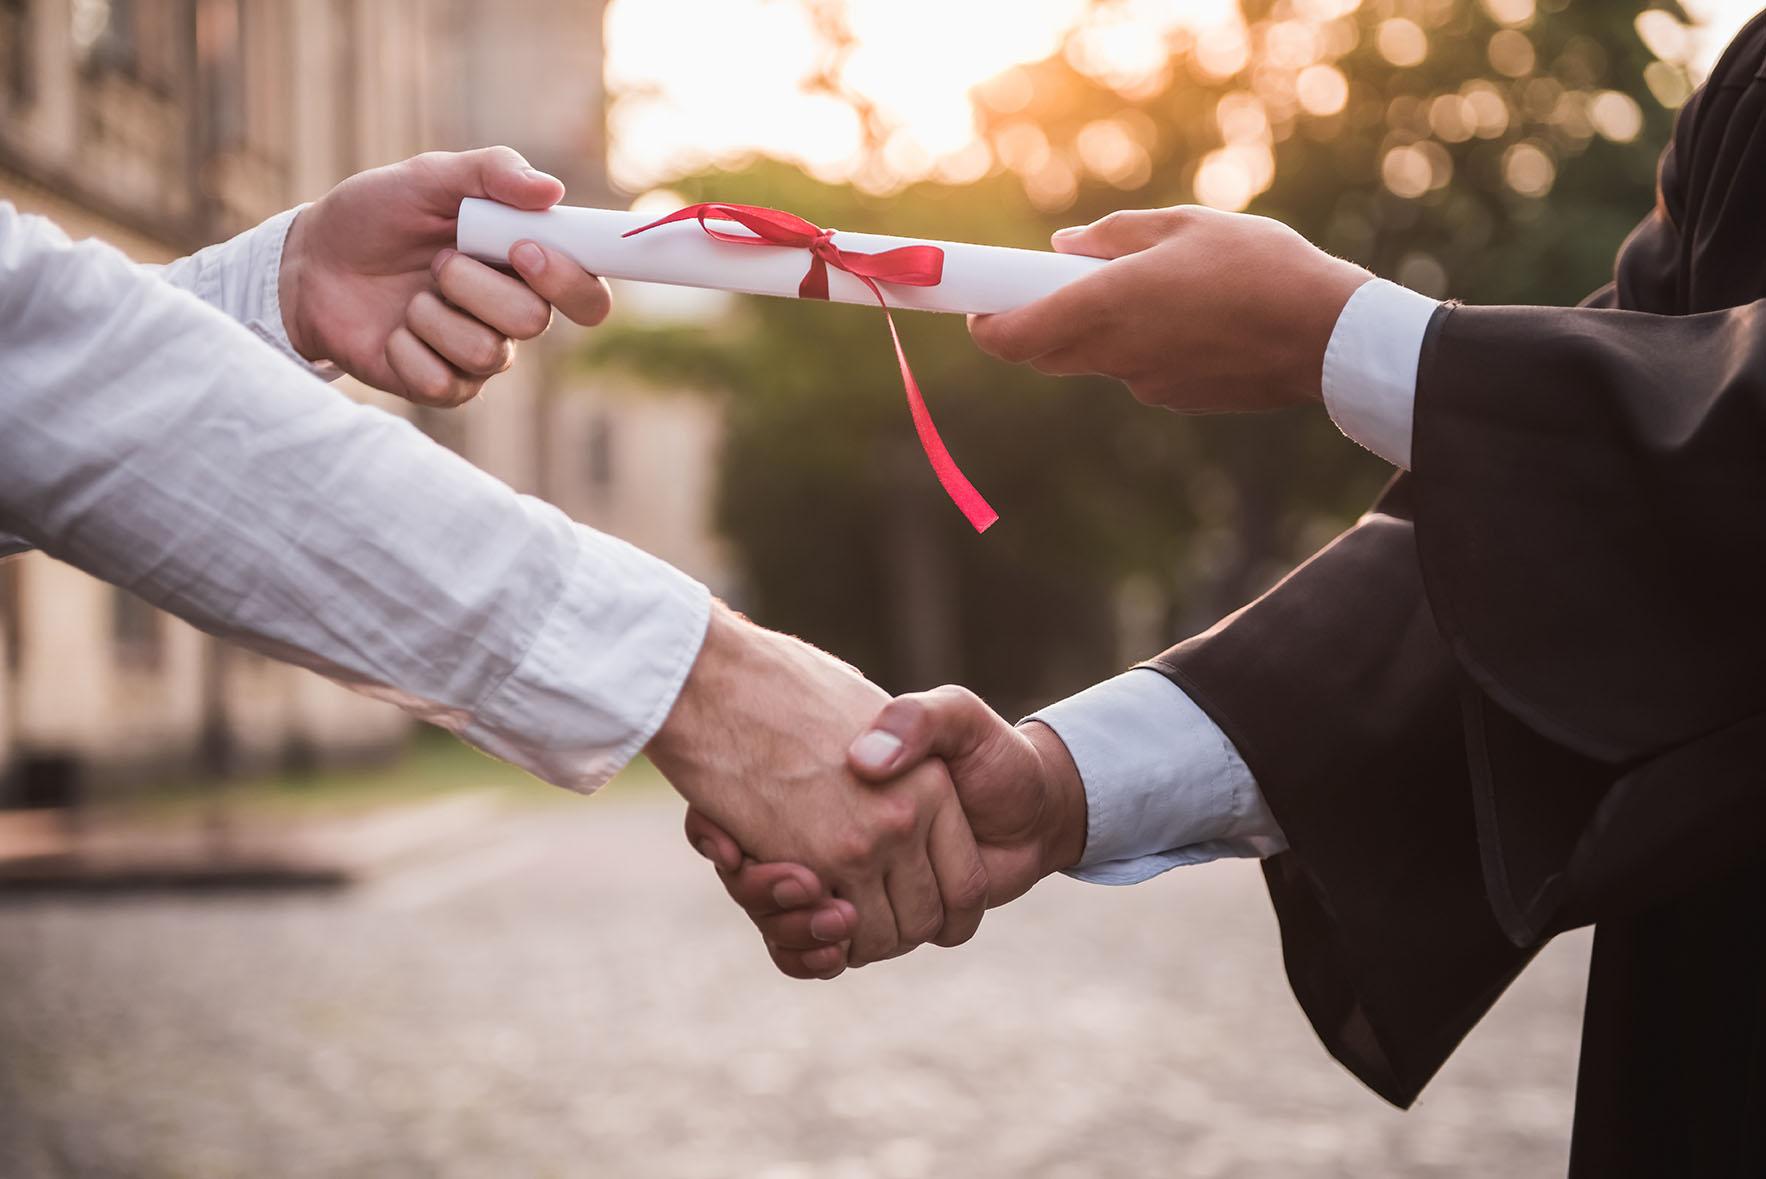 Másteres en Galicia - Dónde estudiar un Máster MBA, RRHH o de Marketing